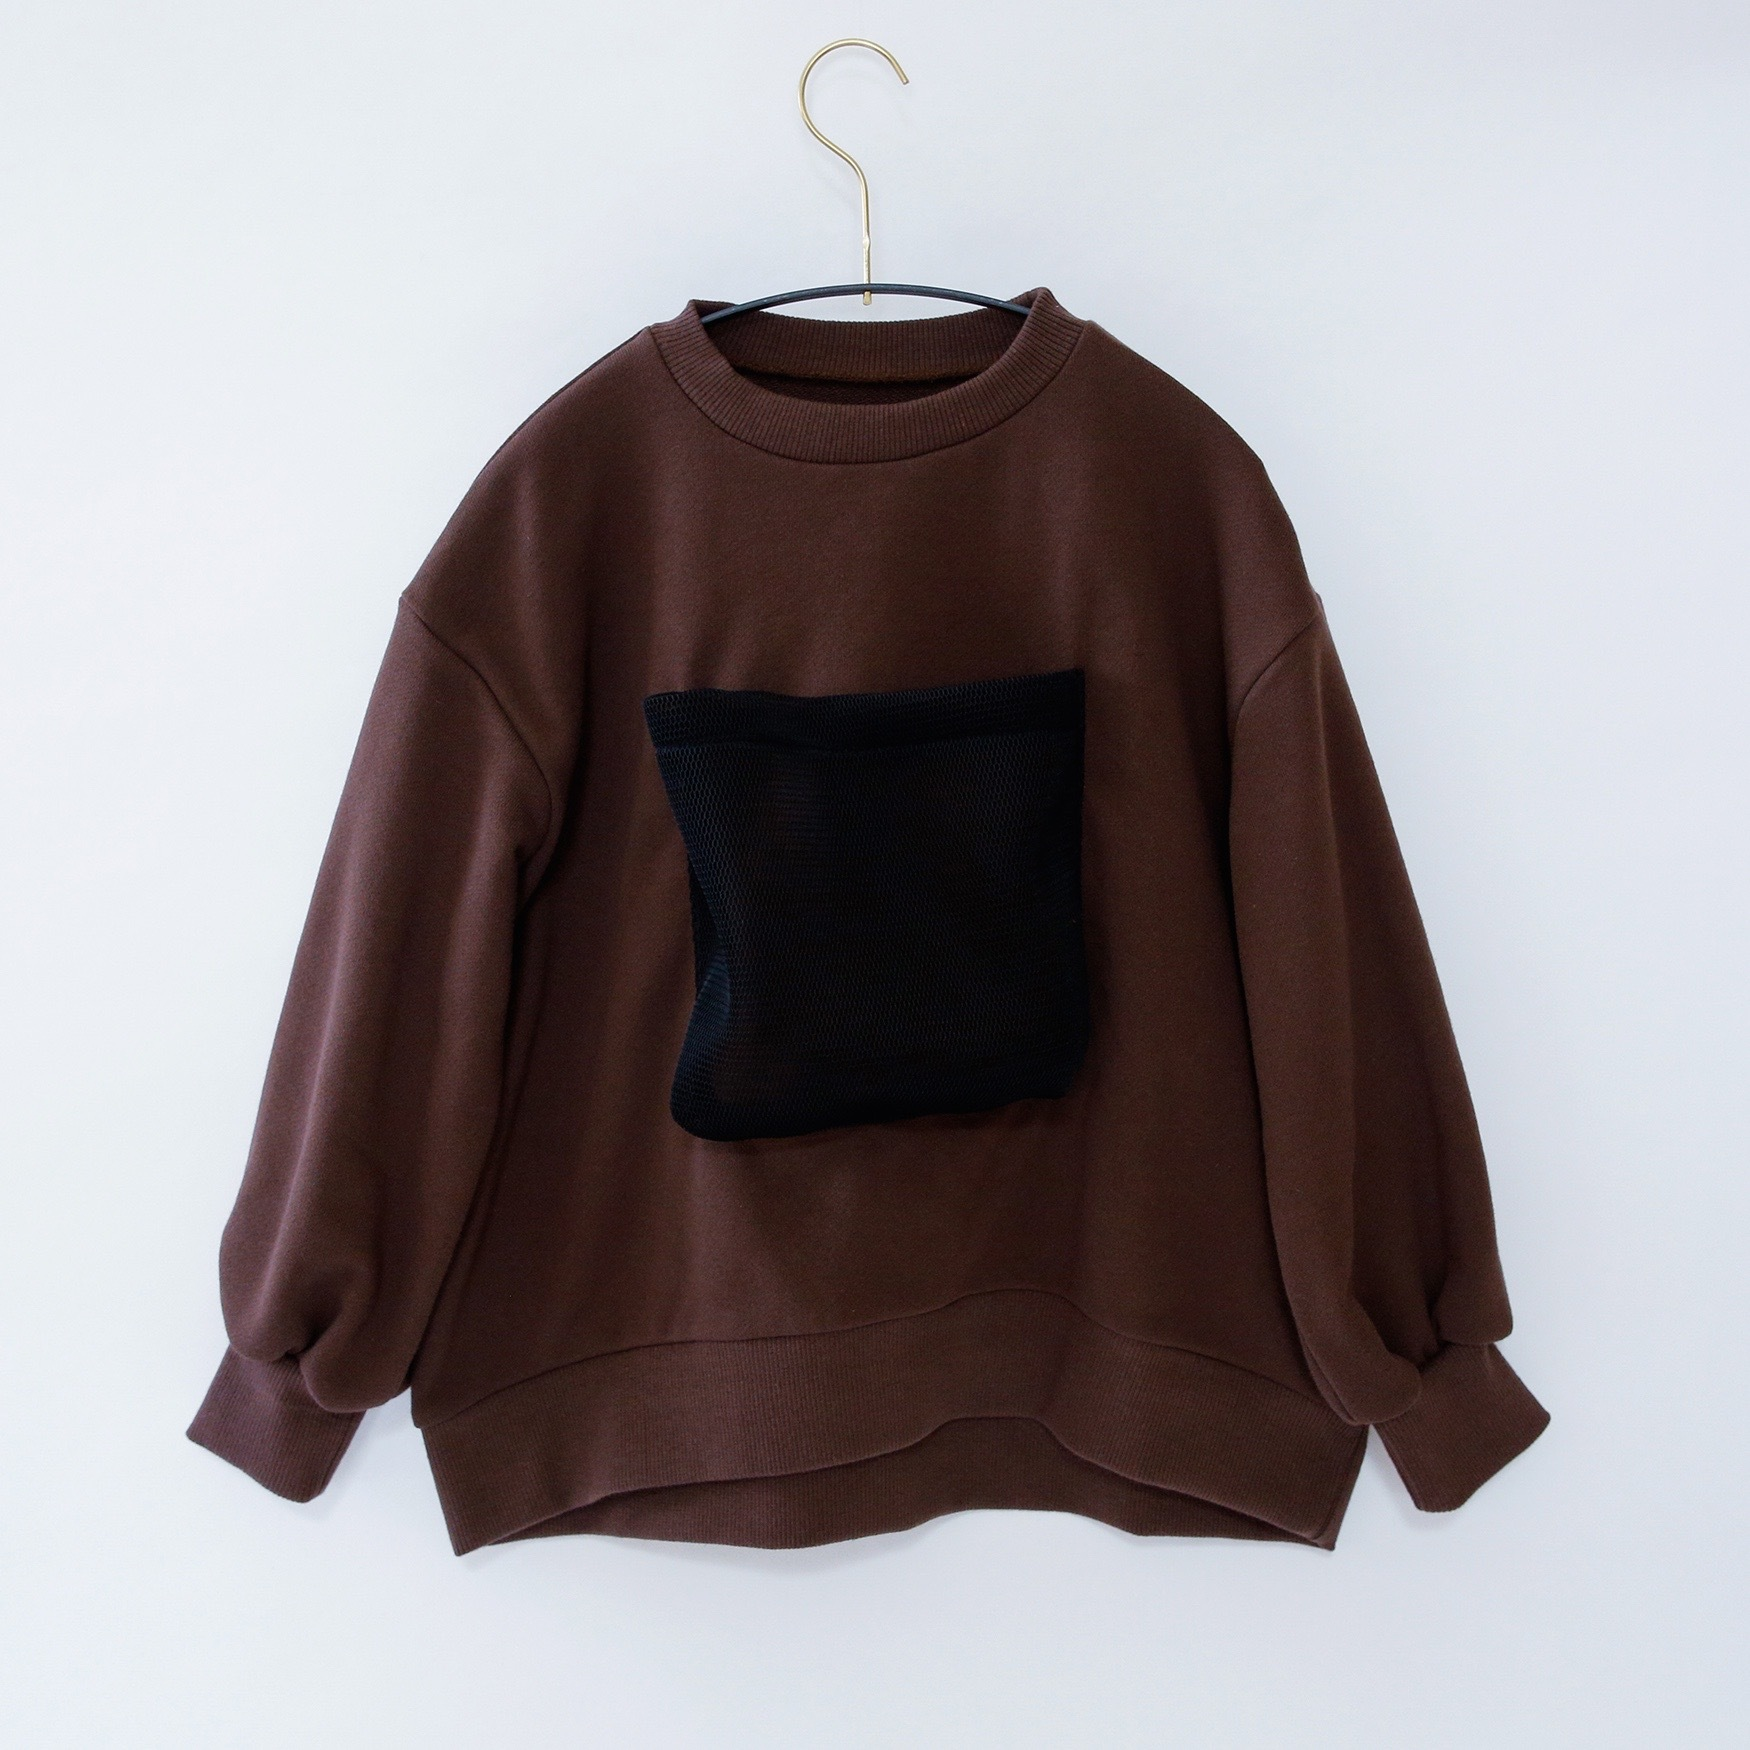 《michirico 2020AW》Front pocket sweats / brown / S・M